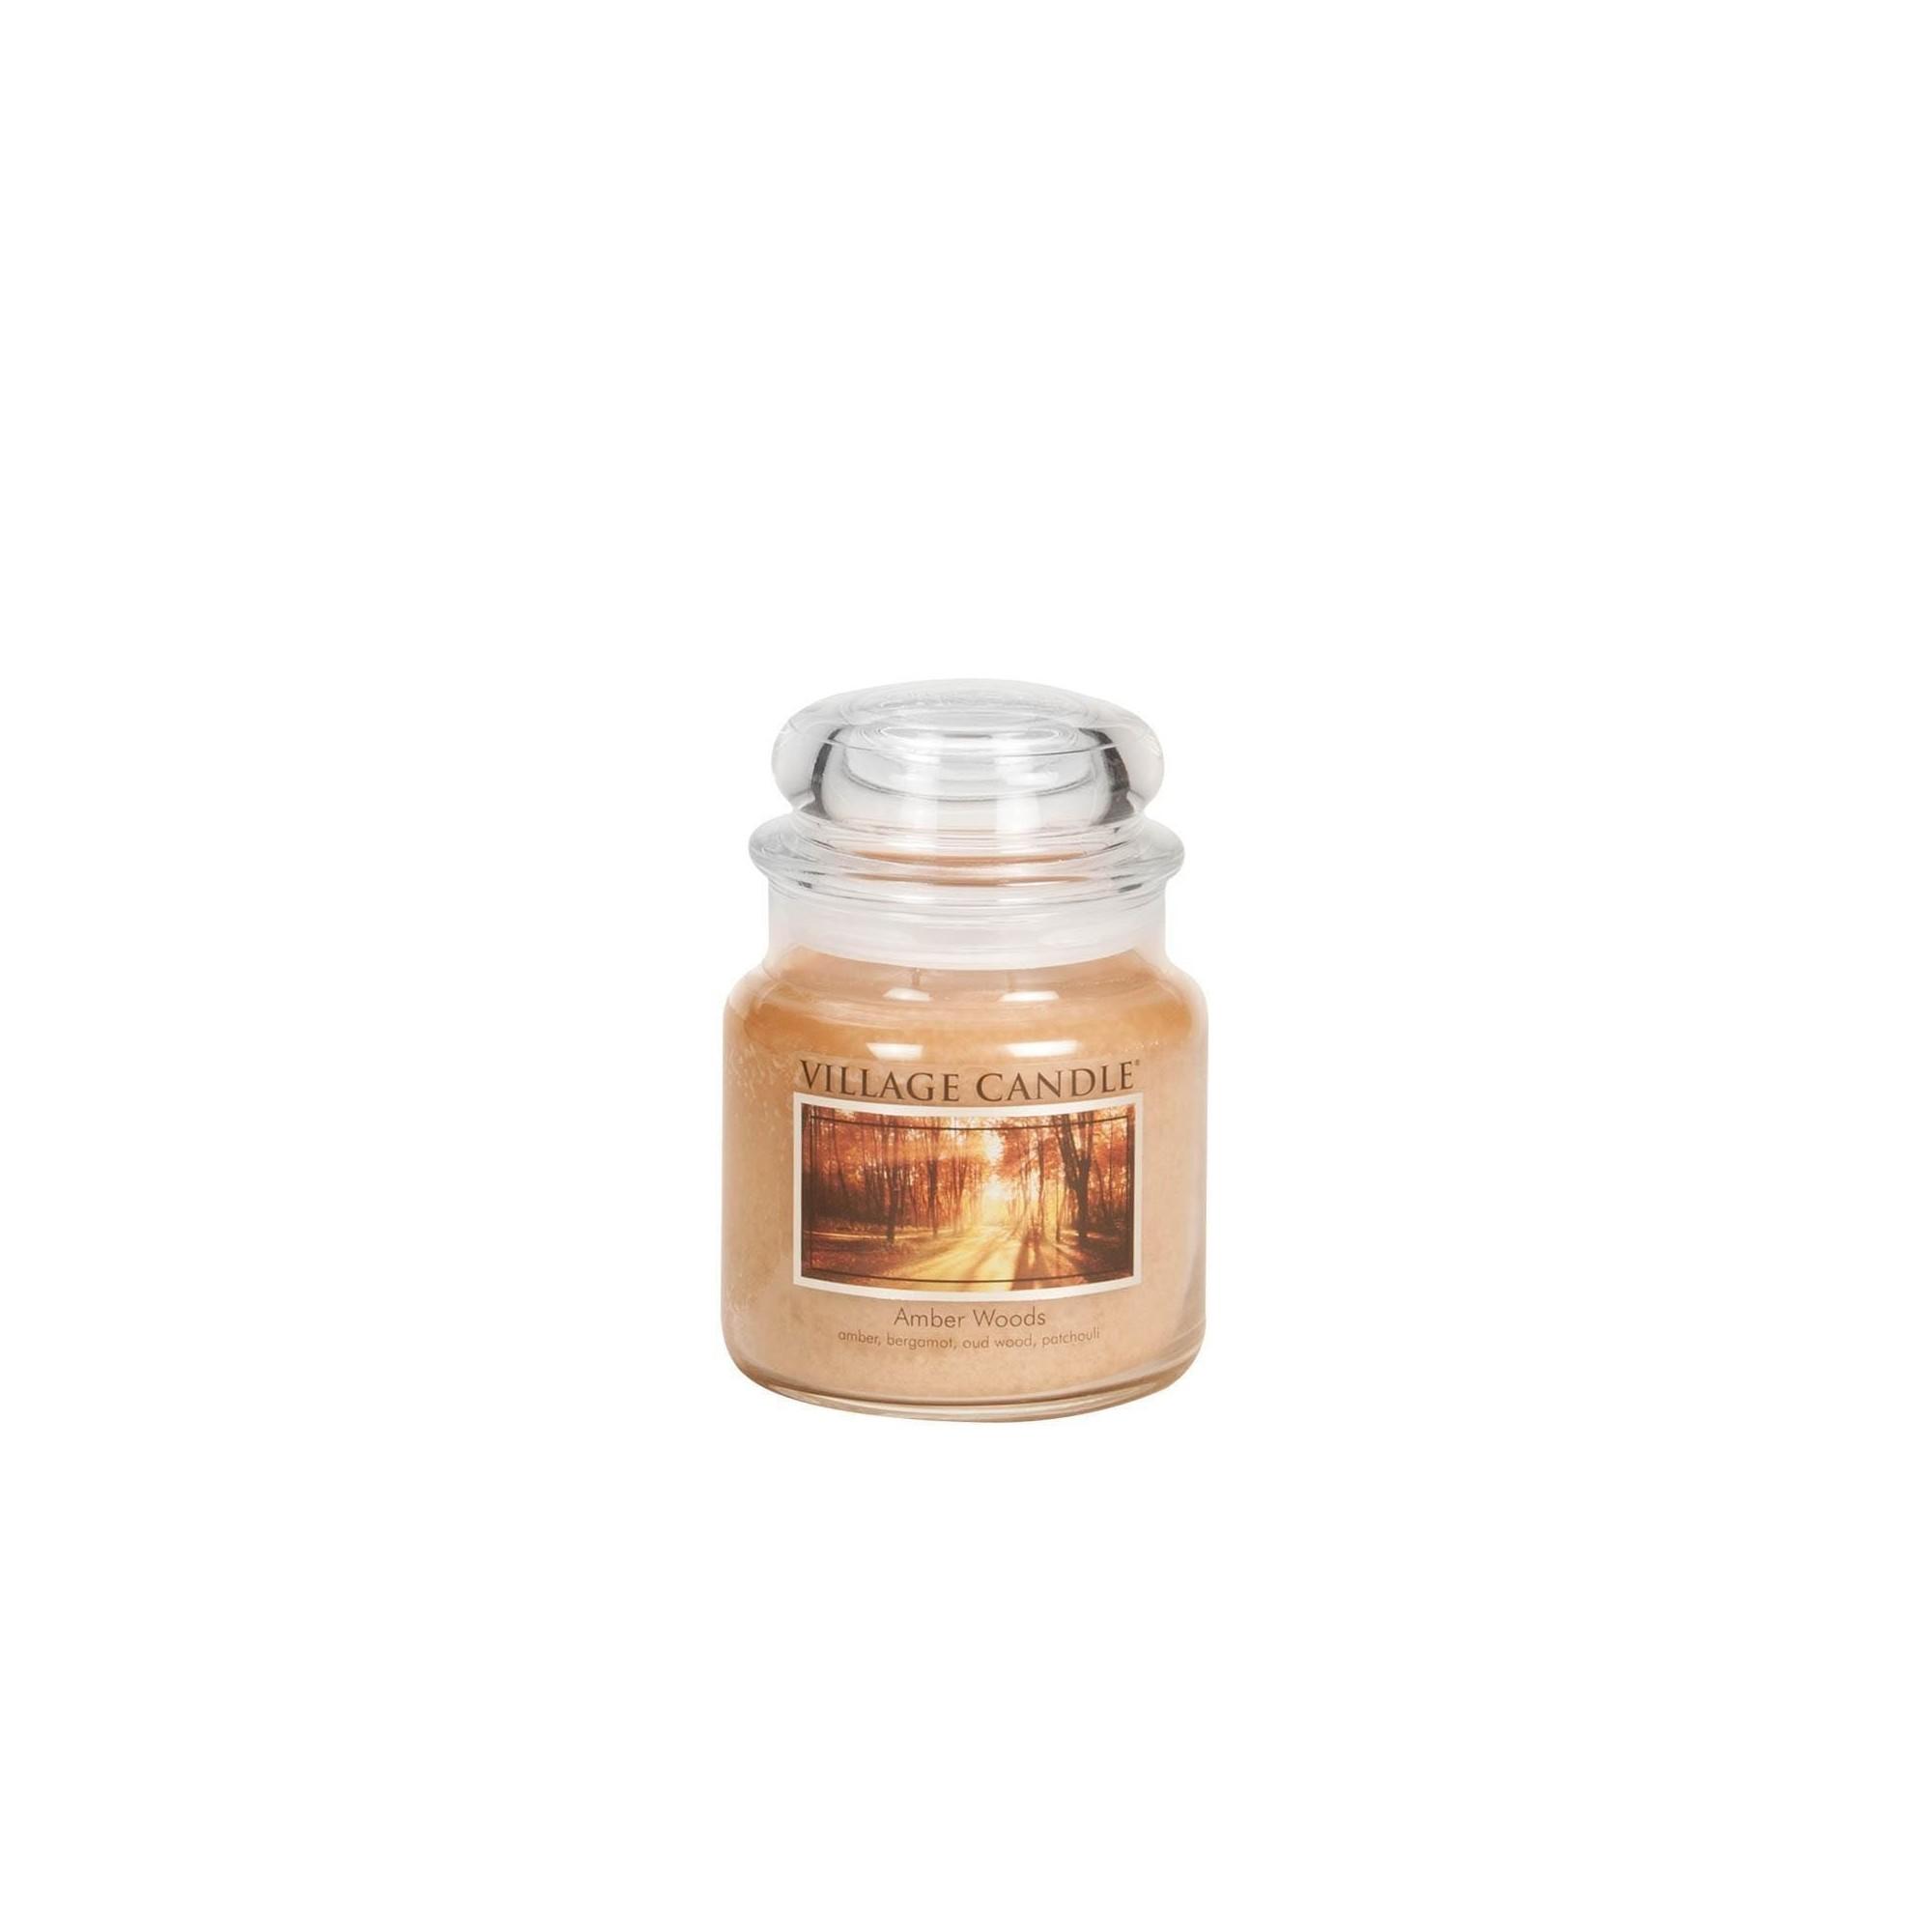 Village Candle Amber Woods Medium Jar Glass